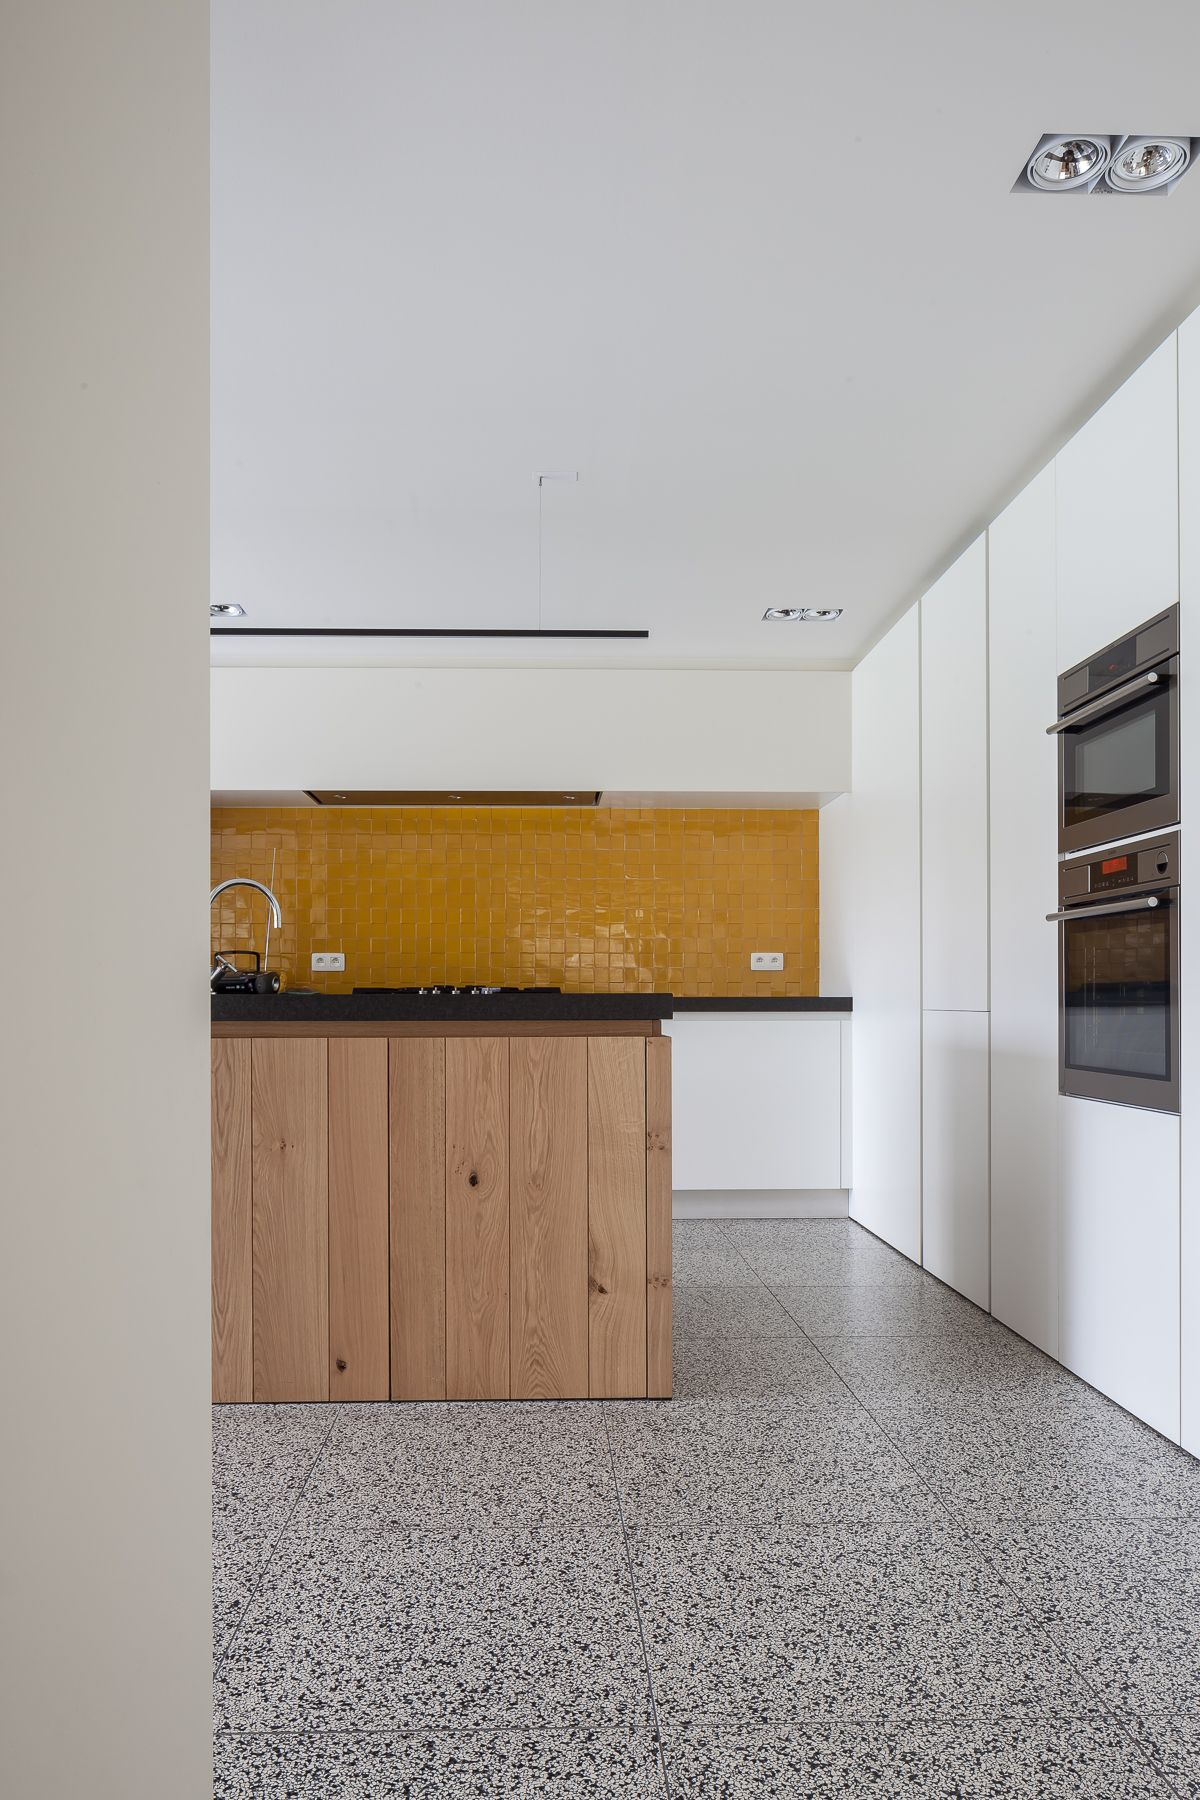 compact tiles by bomarbre cp 1204 amsterdam 60x60 mr granito mrs terrazzo pinterest. Black Bedroom Furniture Sets. Home Design Ideas